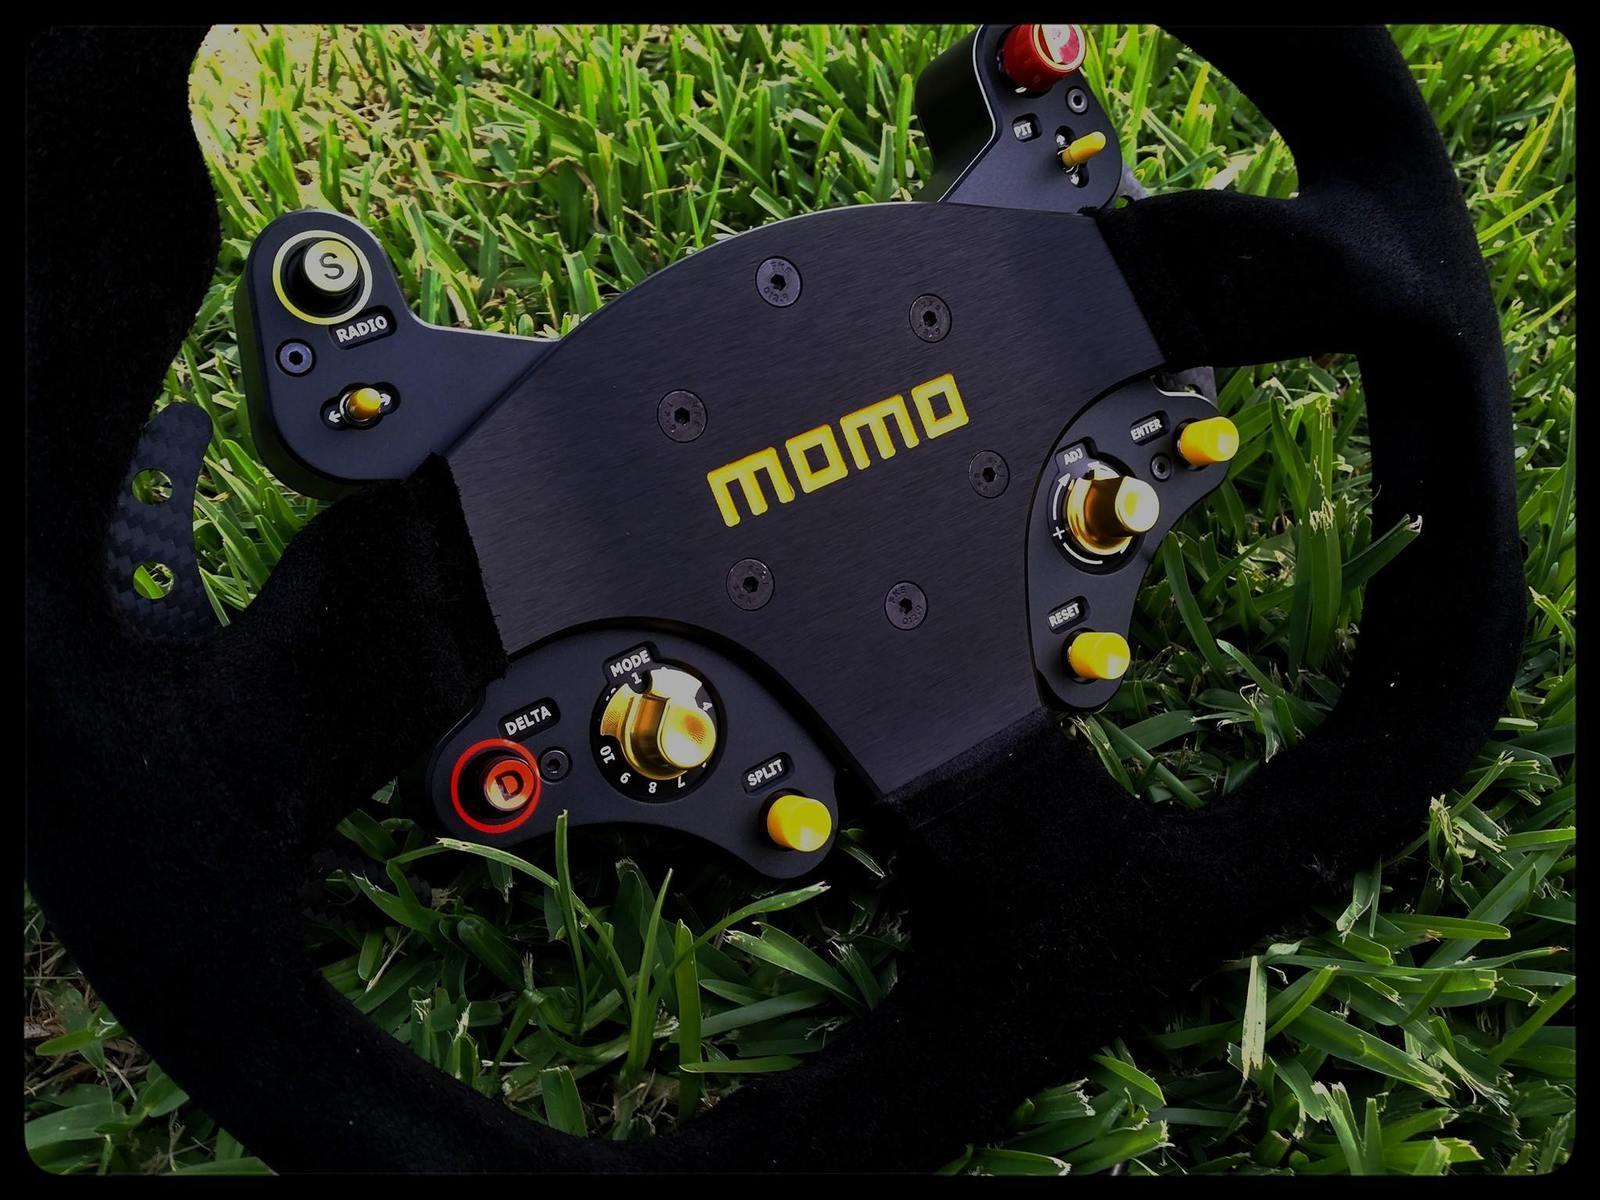 Volant MOMO Mod30 Hybrid Racing Simulations : into the wild